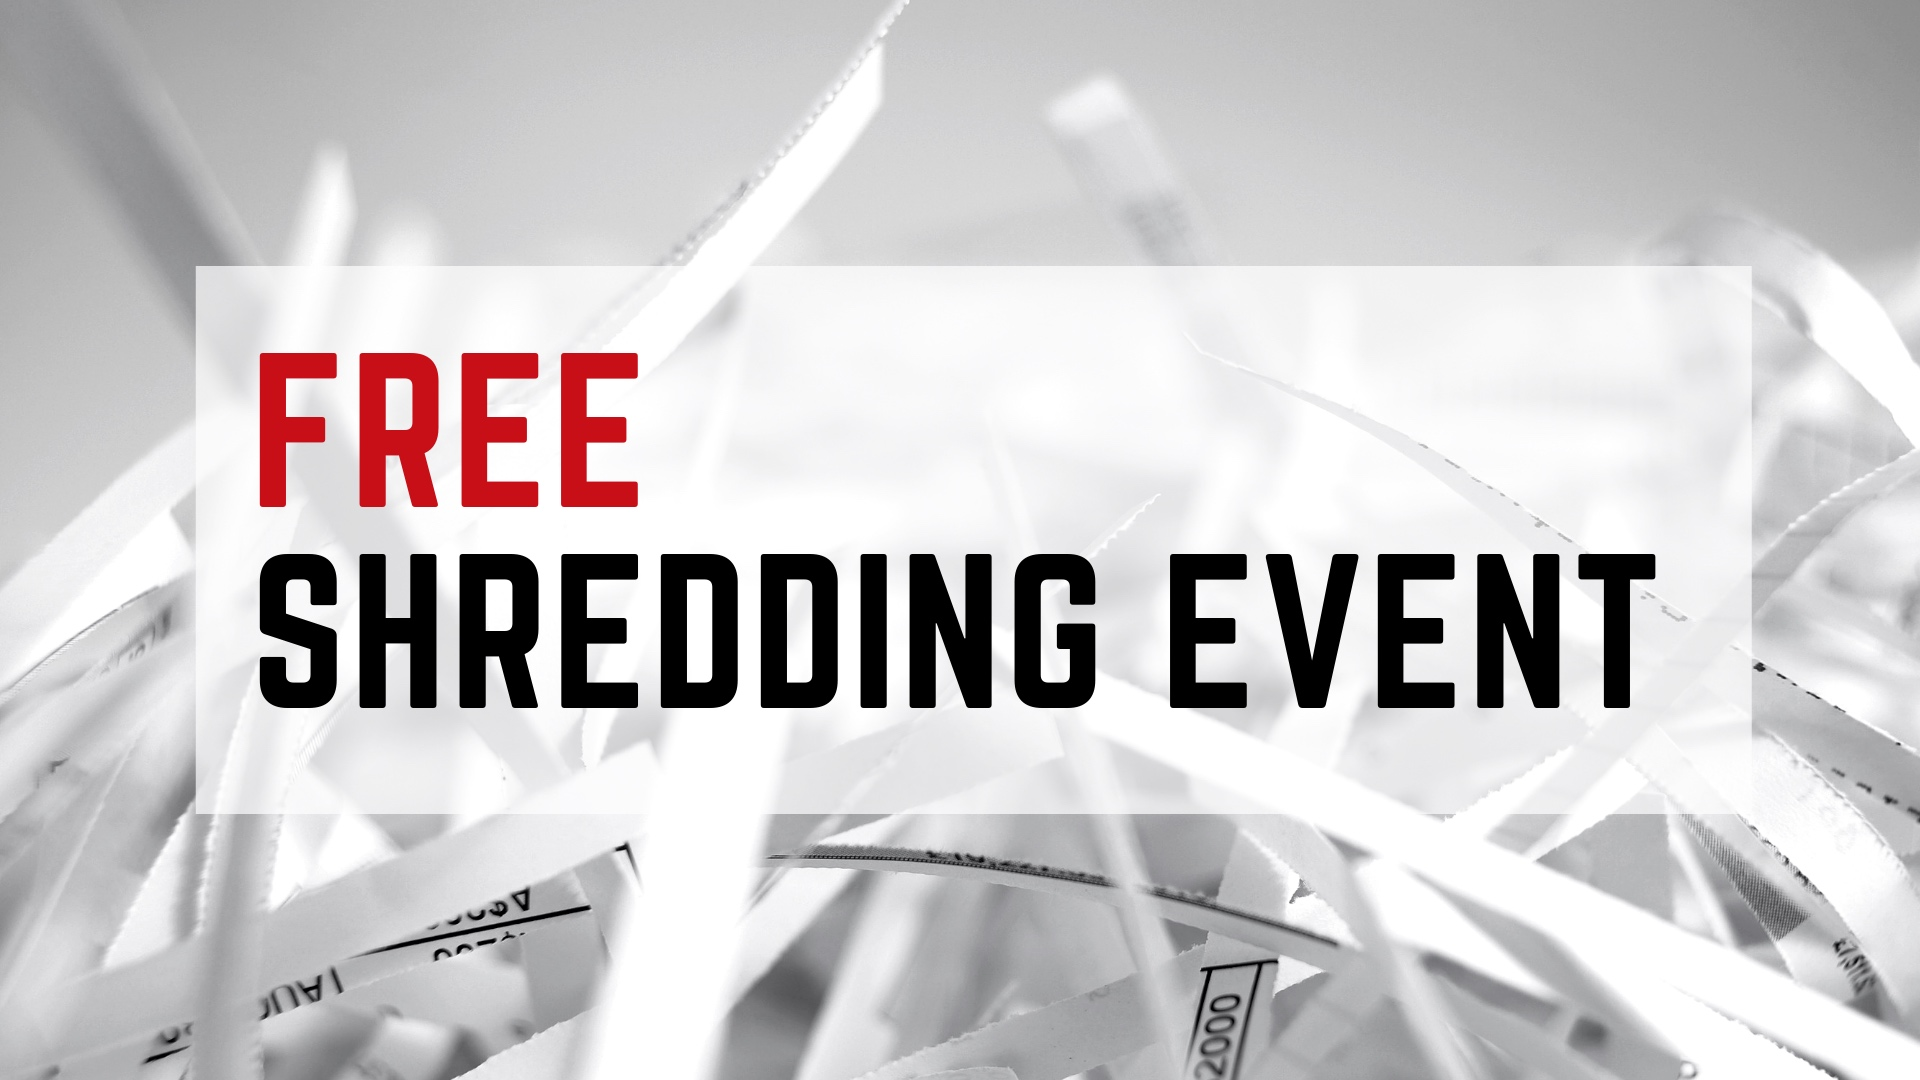 FREE+SHREDDING+EVENT.jpg